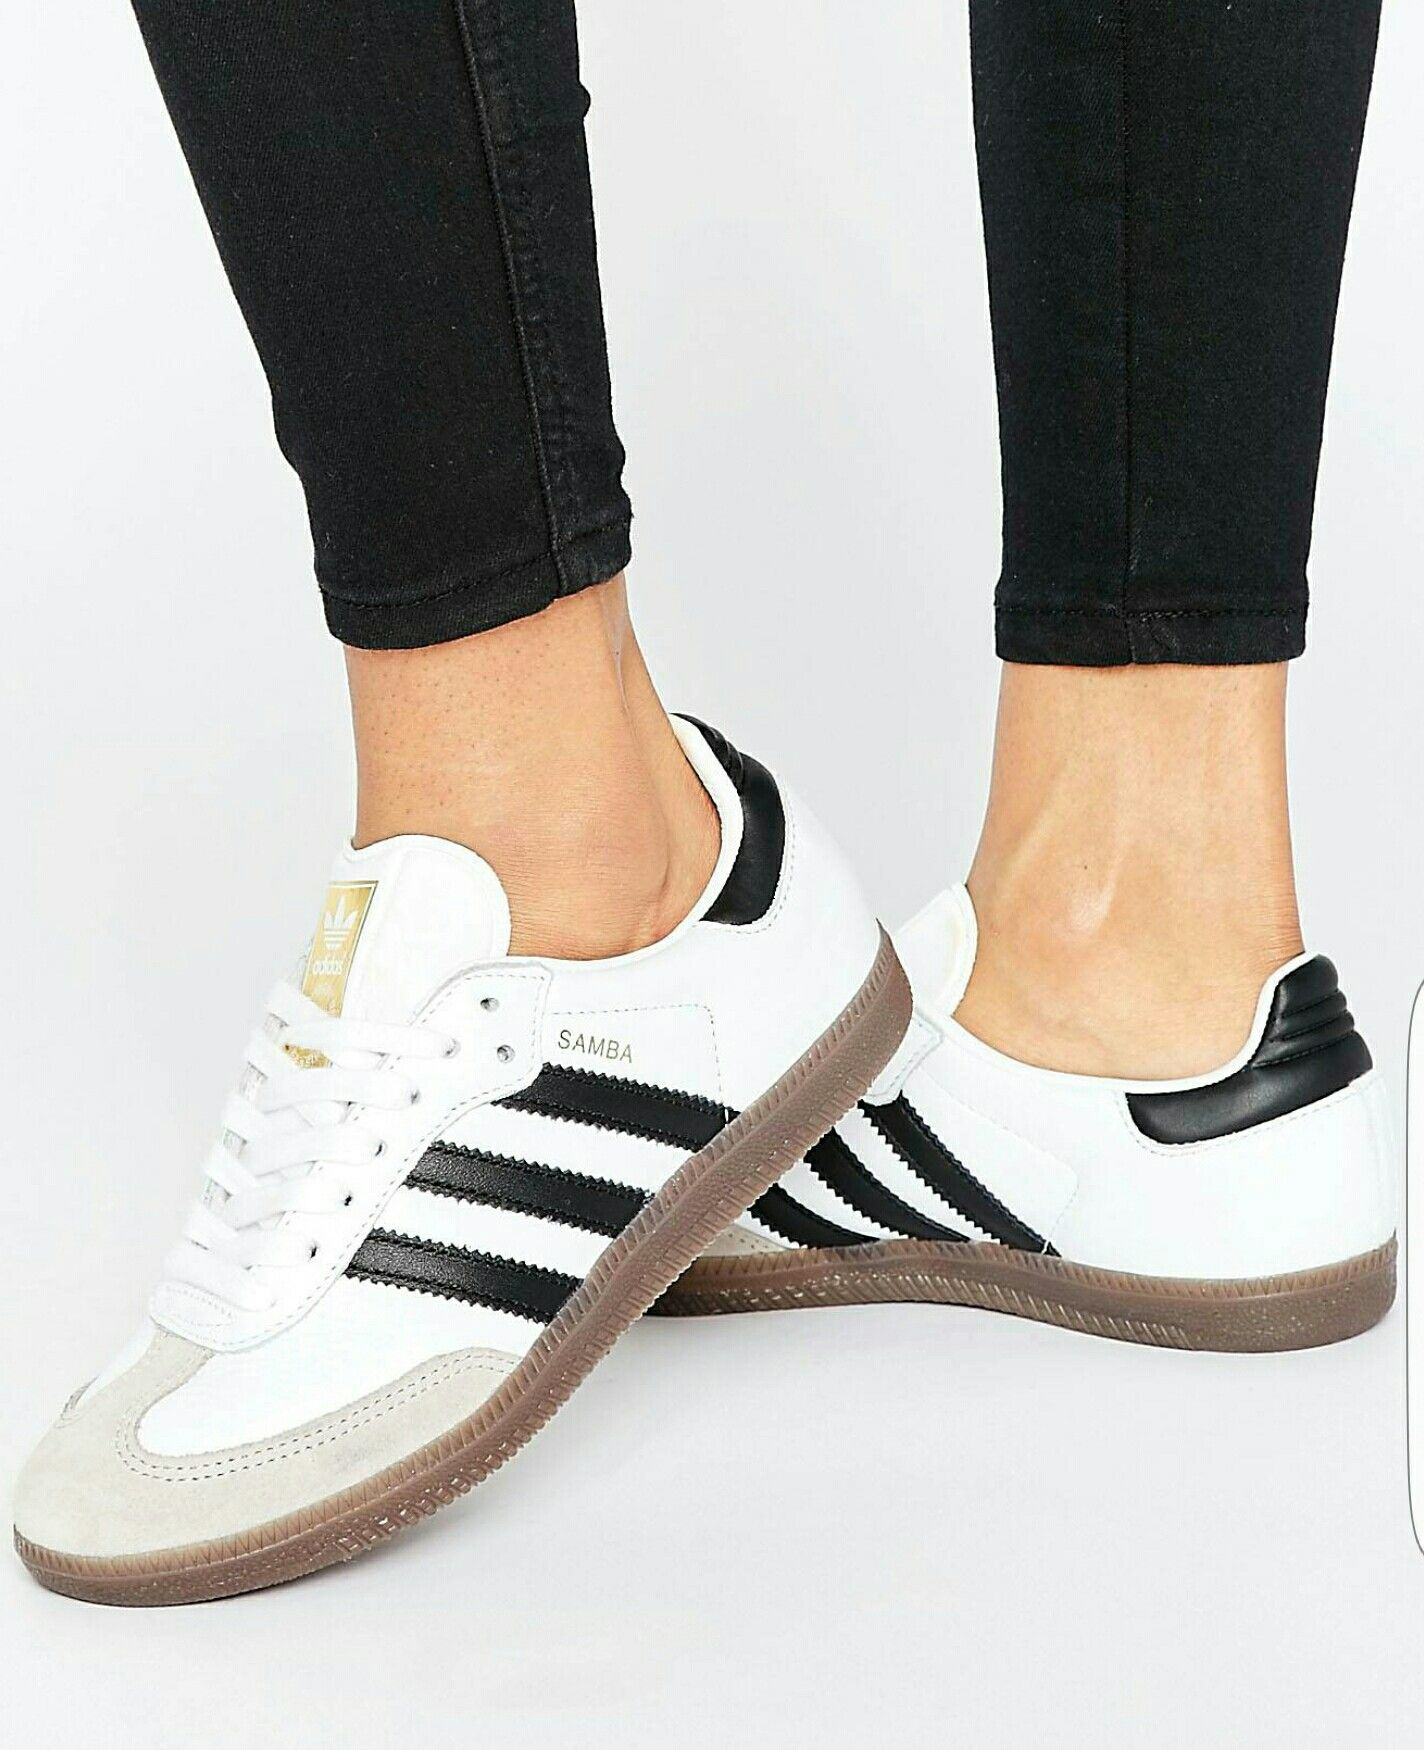 Shoes SambaSummer Und Adidas ZapatillasModa Zapatos 354RLAjq